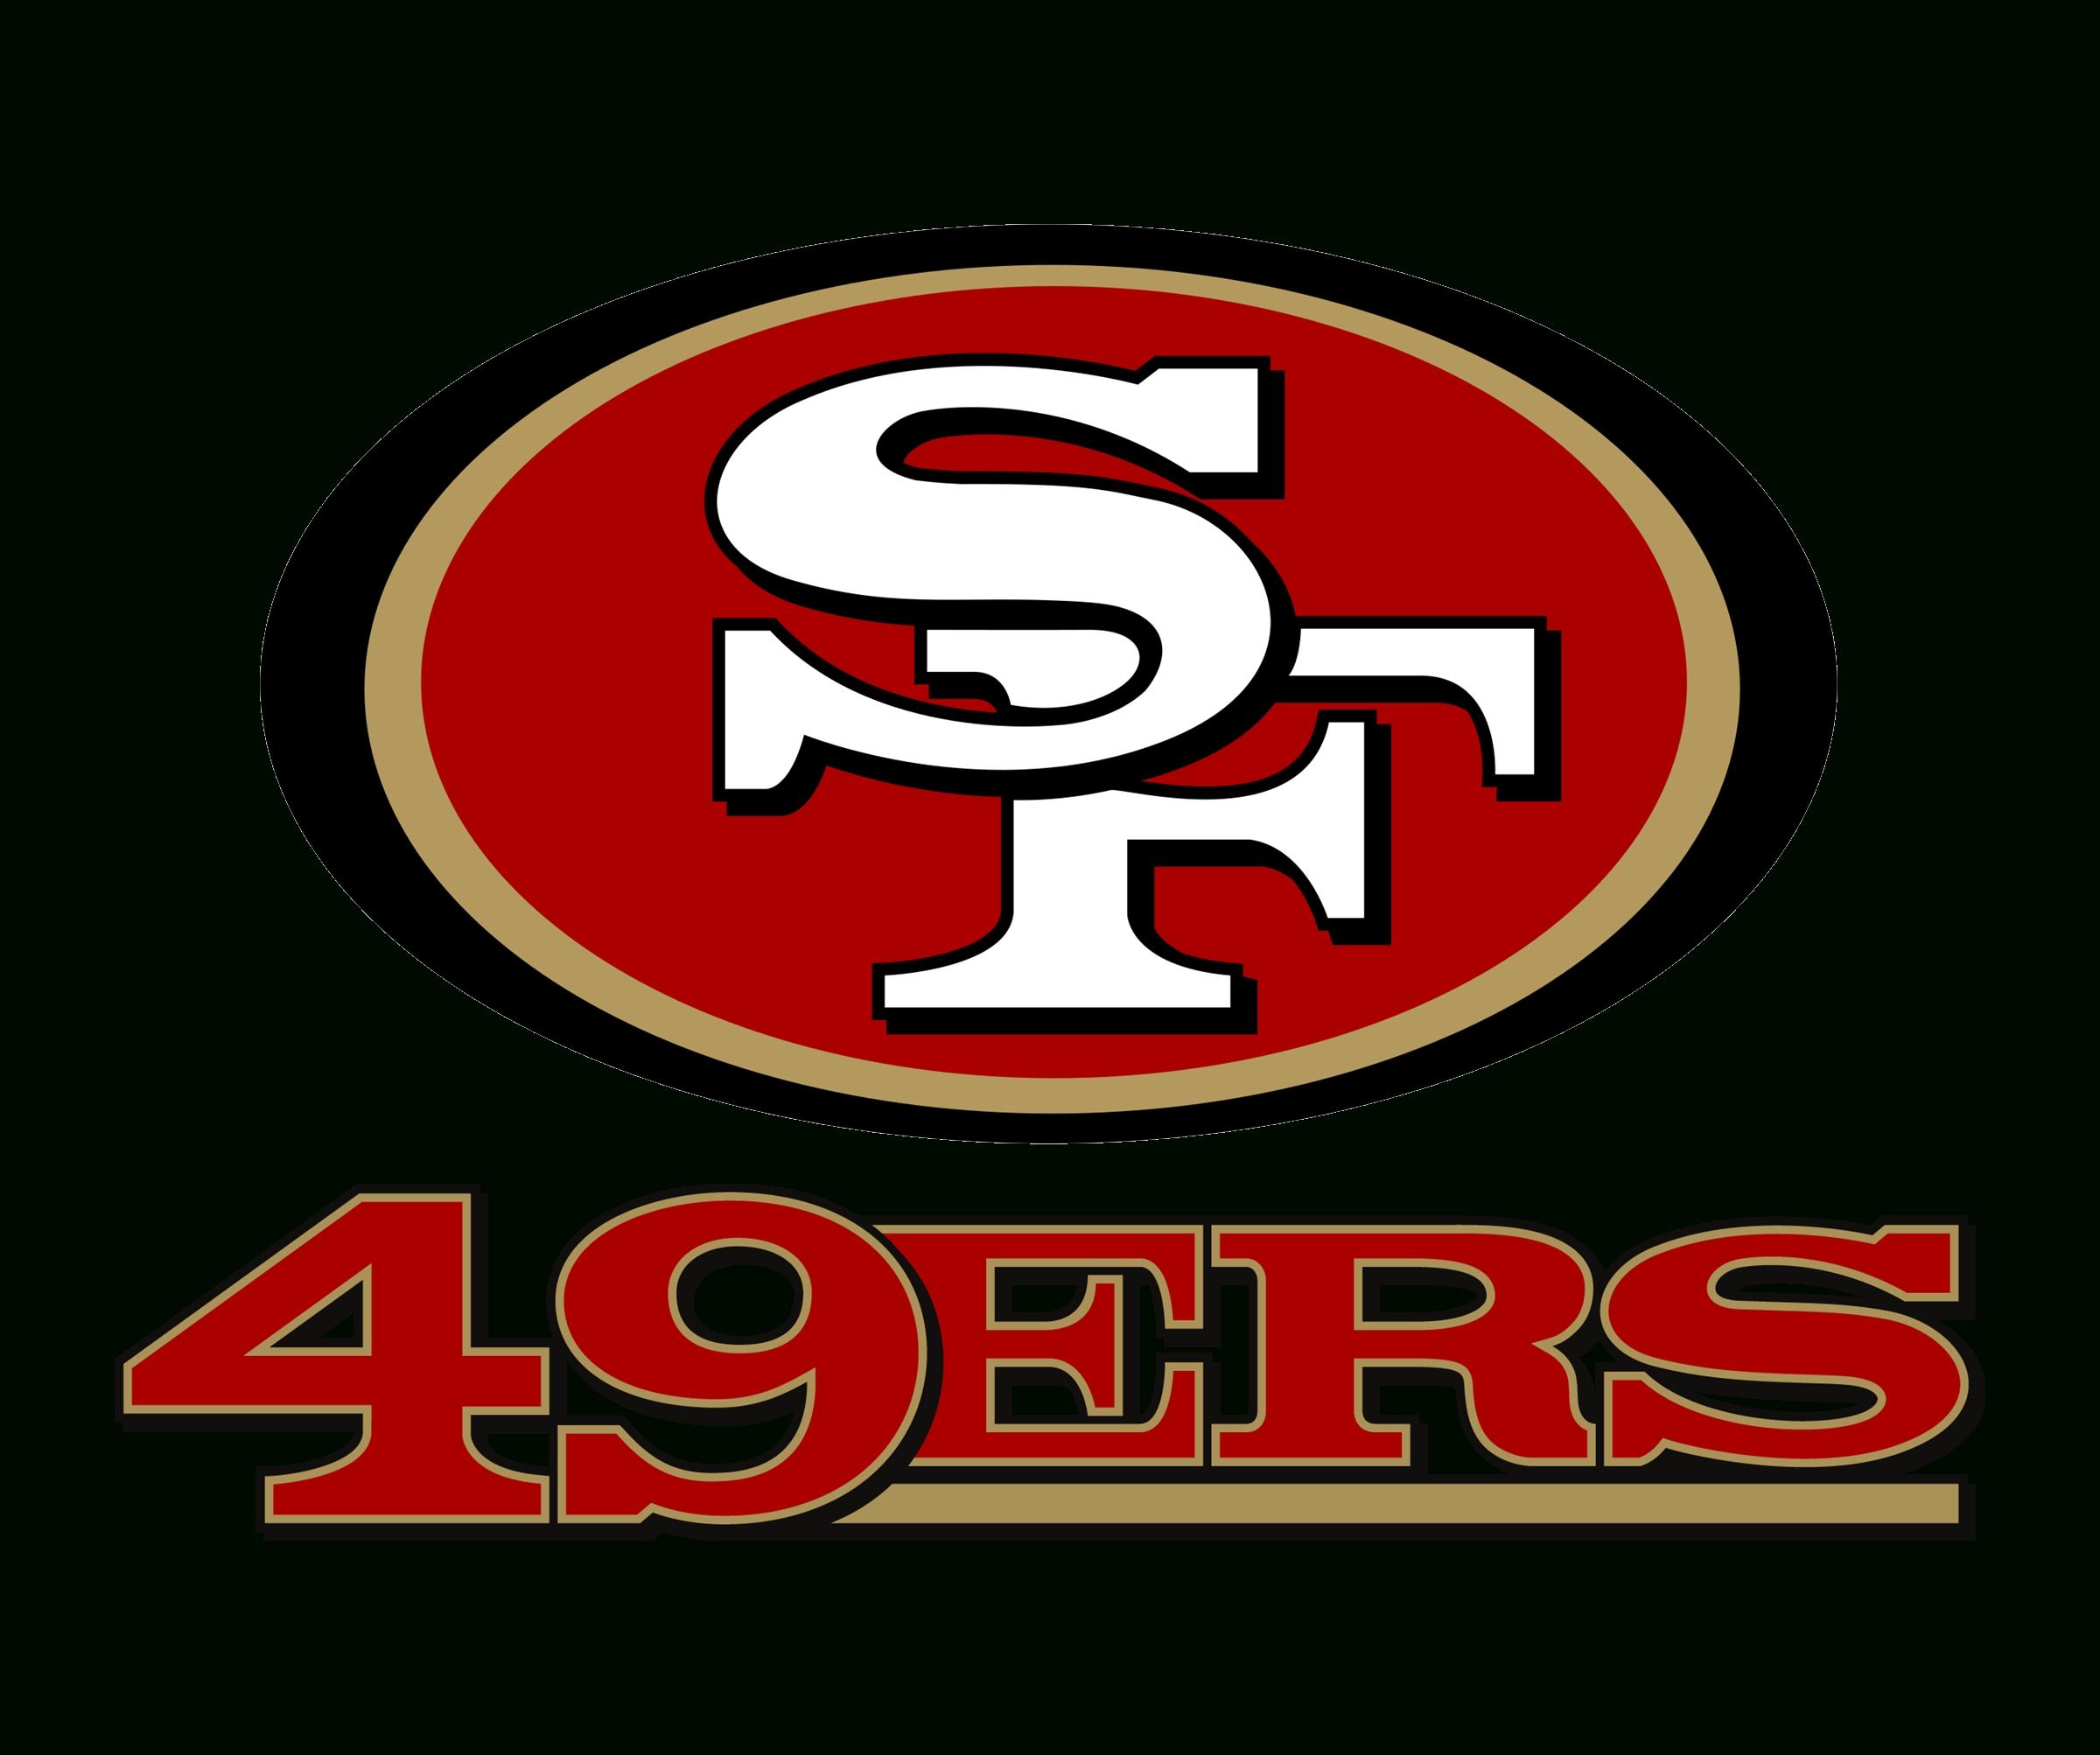 san francisco 49ers logo png transparent & svg vector - freebie supply